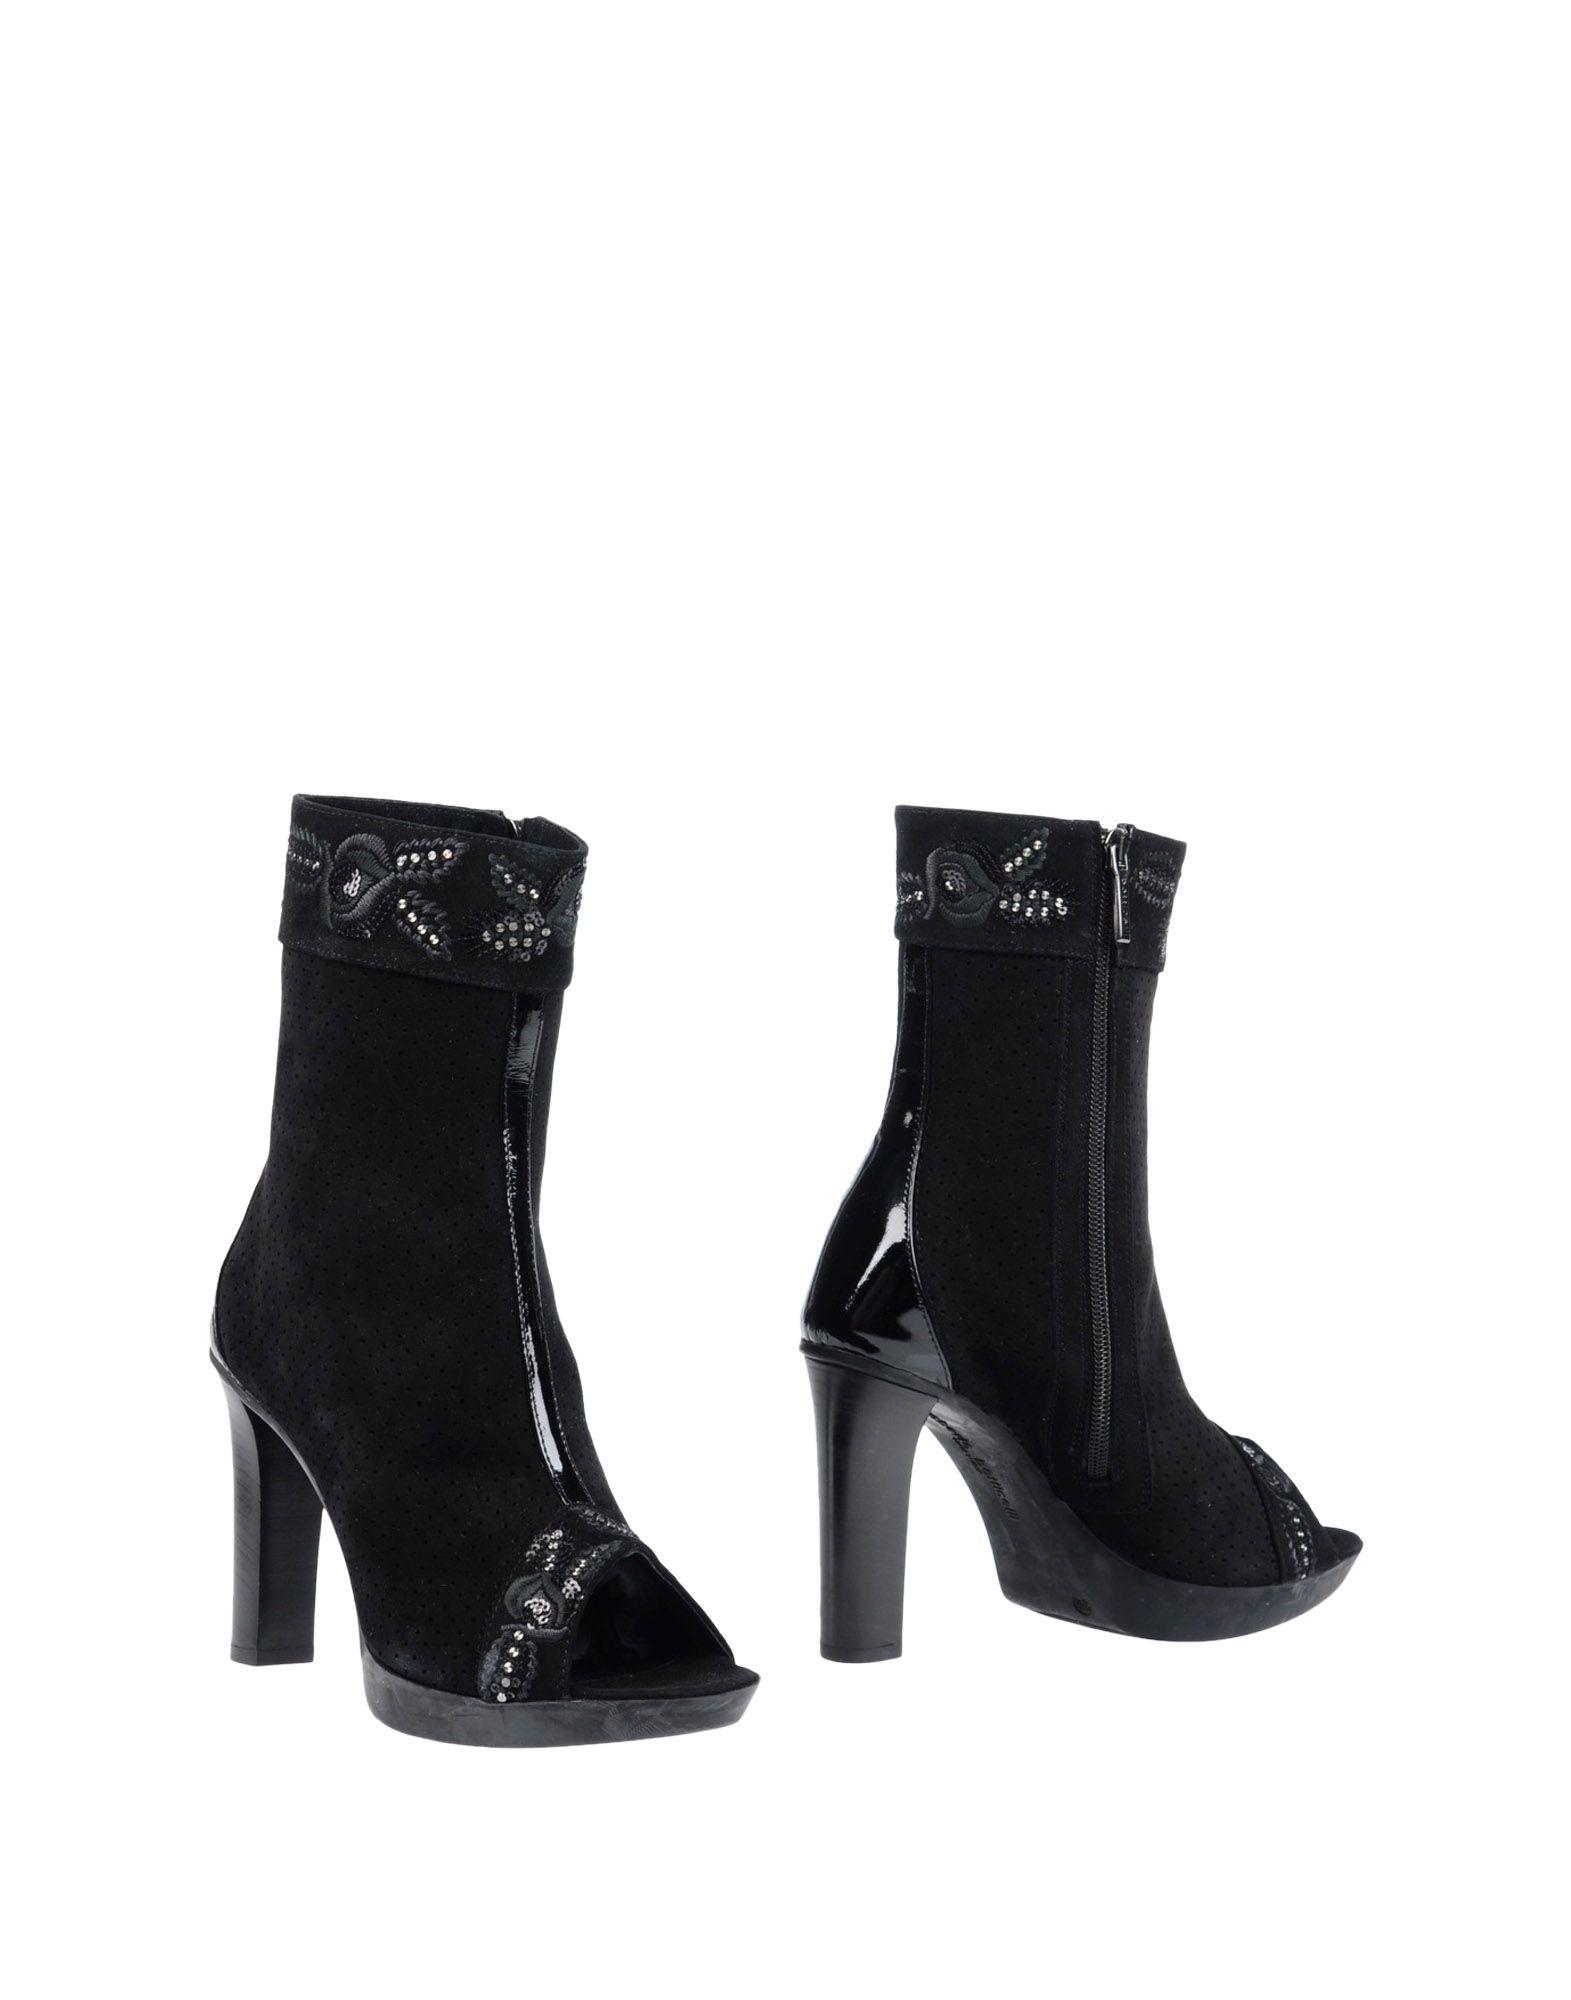 roberto botticelli luxury полусапоги и высокие ботинки ROBERTO BOTTICELLI LUXURY Полусапоги и высокие ботинки